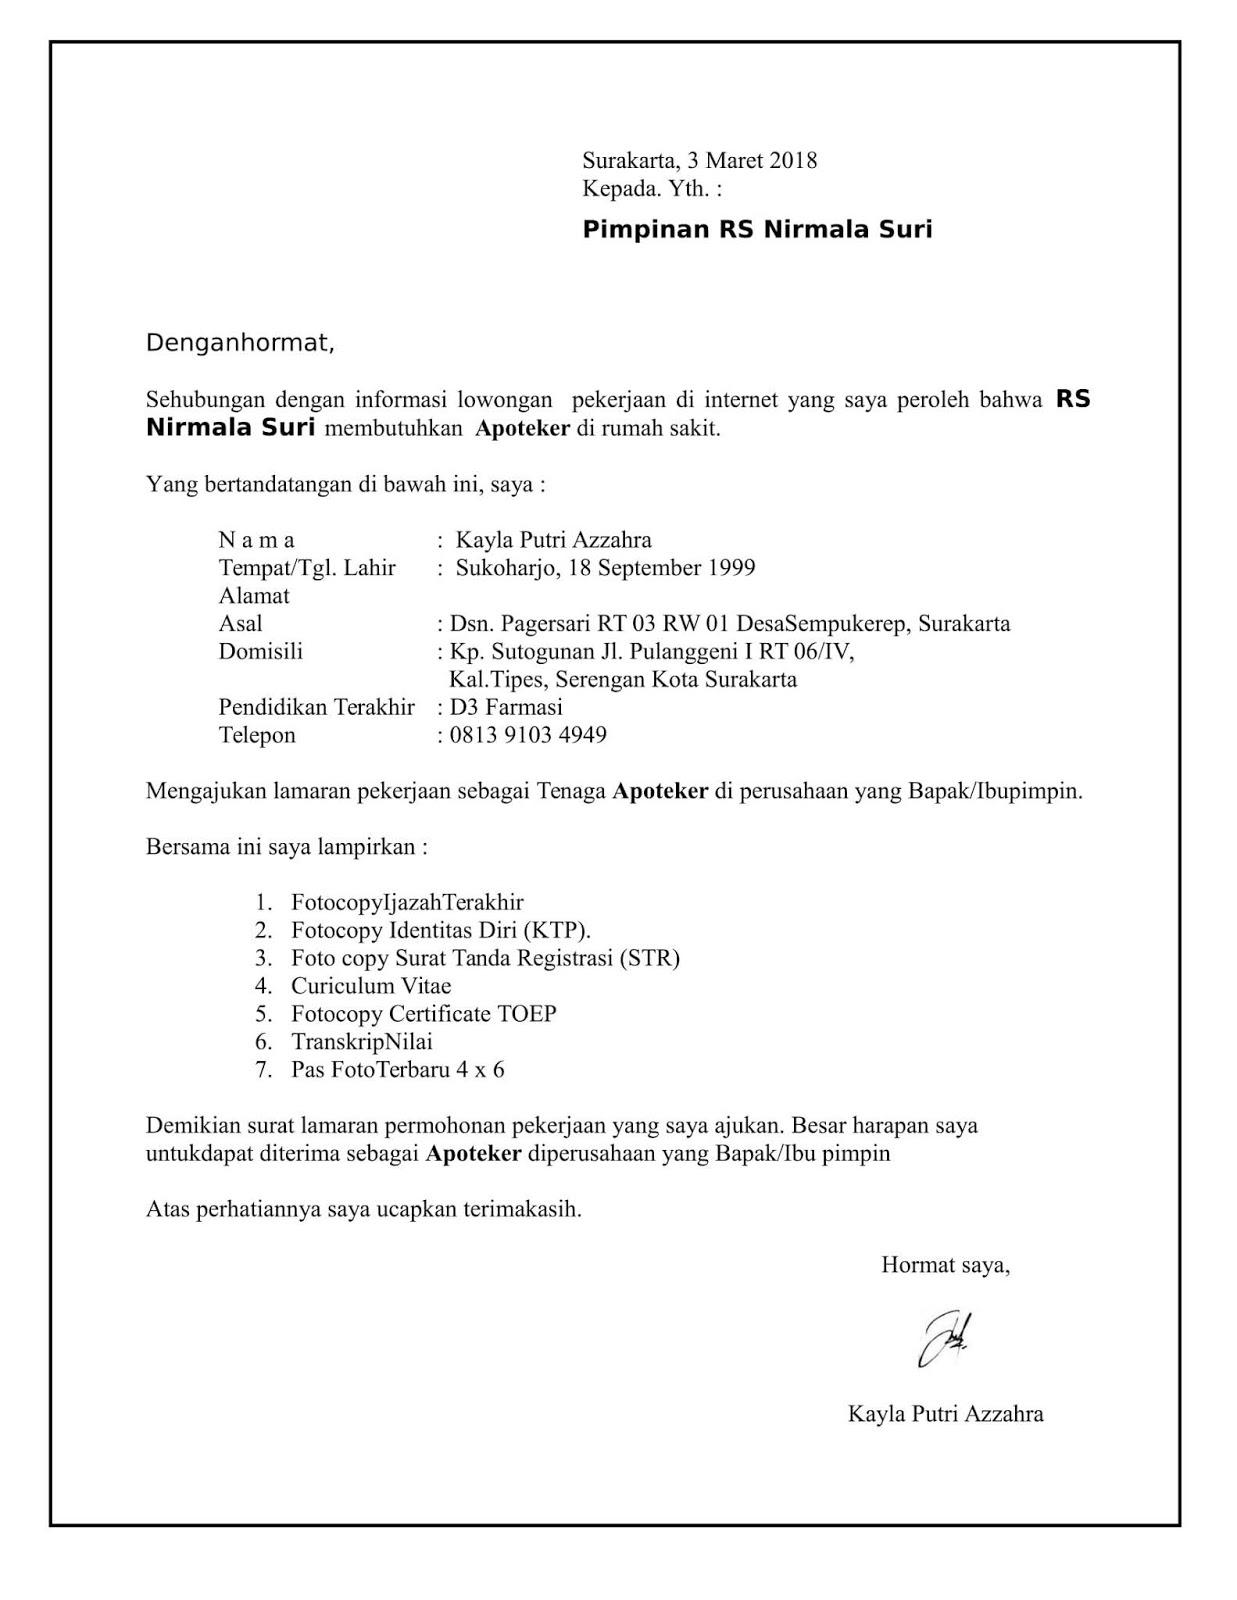 Contoh surat lamaran kerja di Rumah Sakit sebagai apoteker